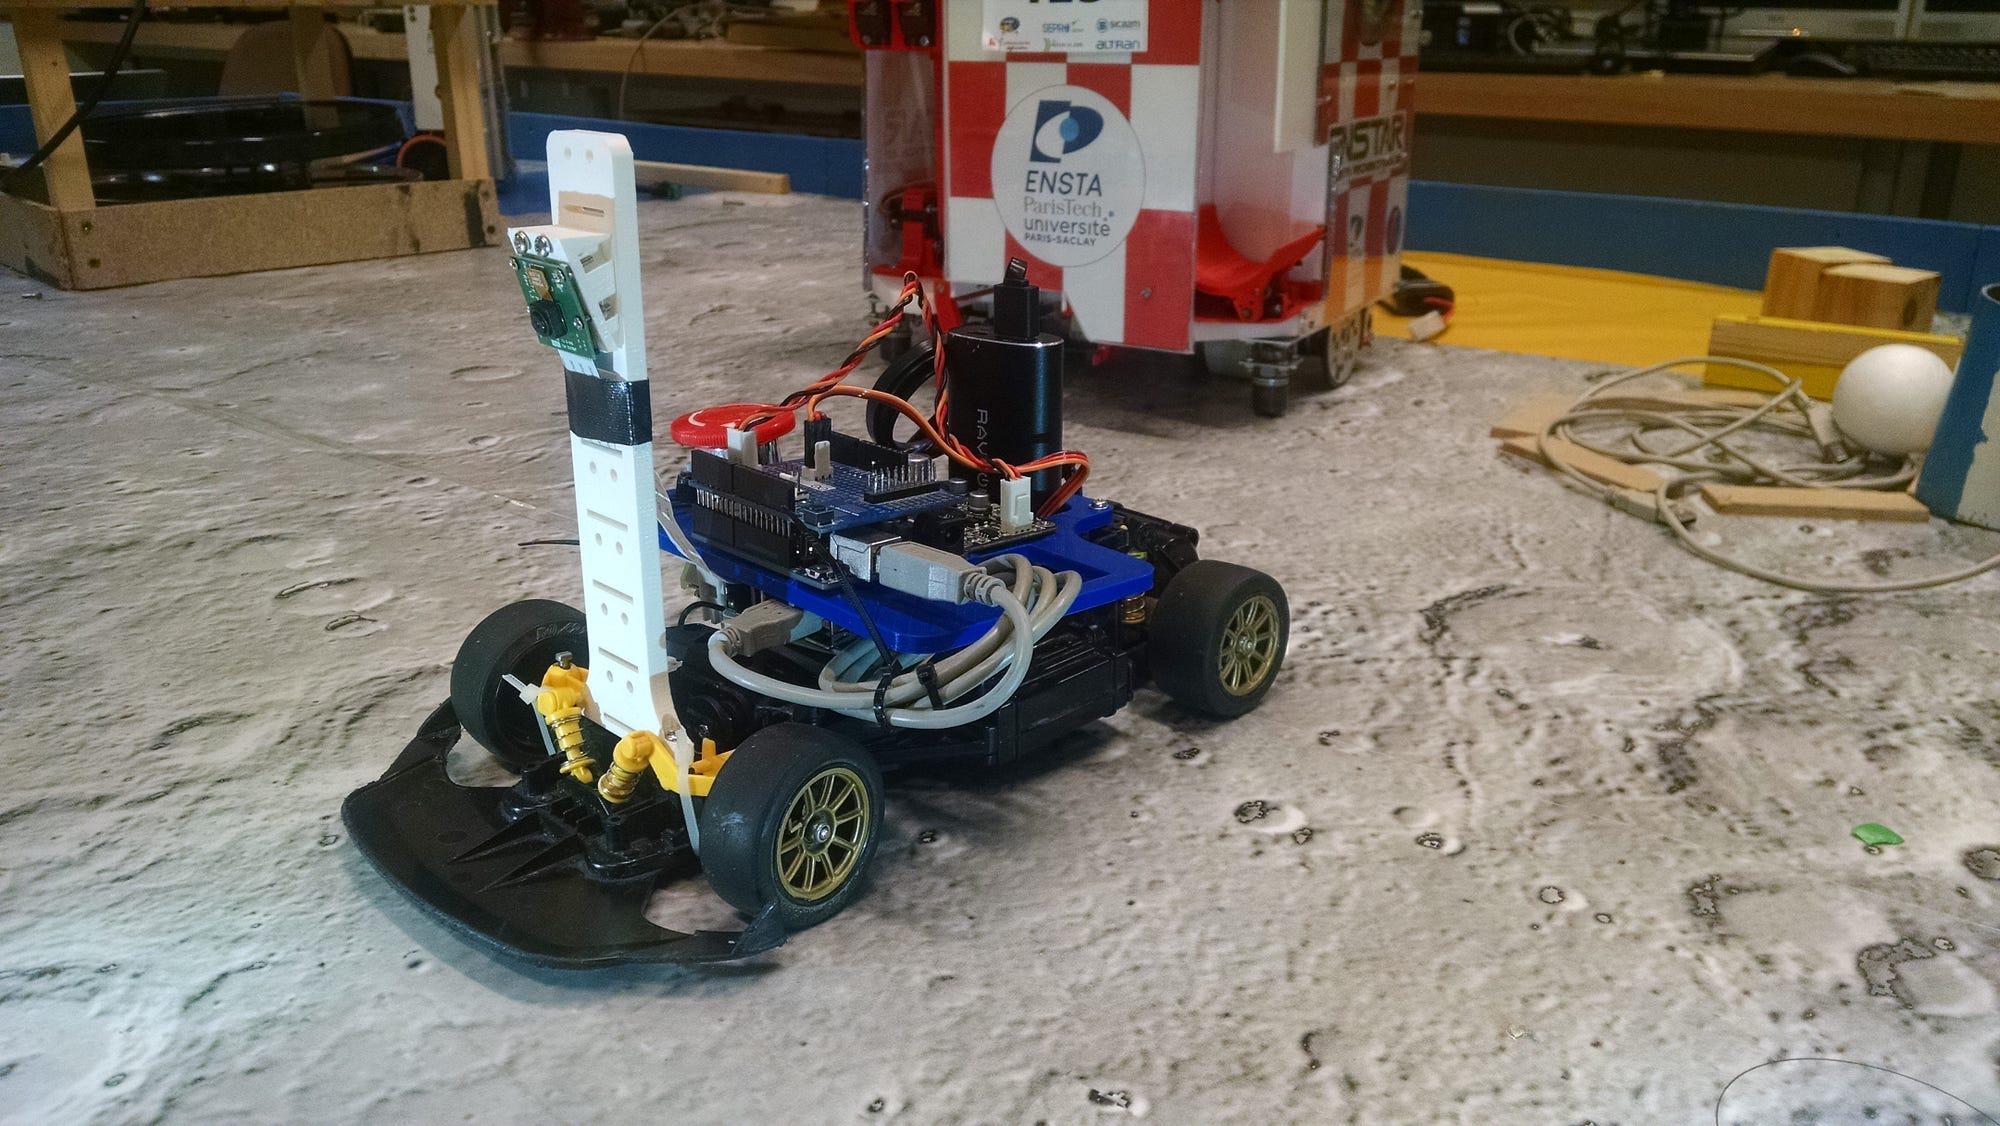 The racing robot